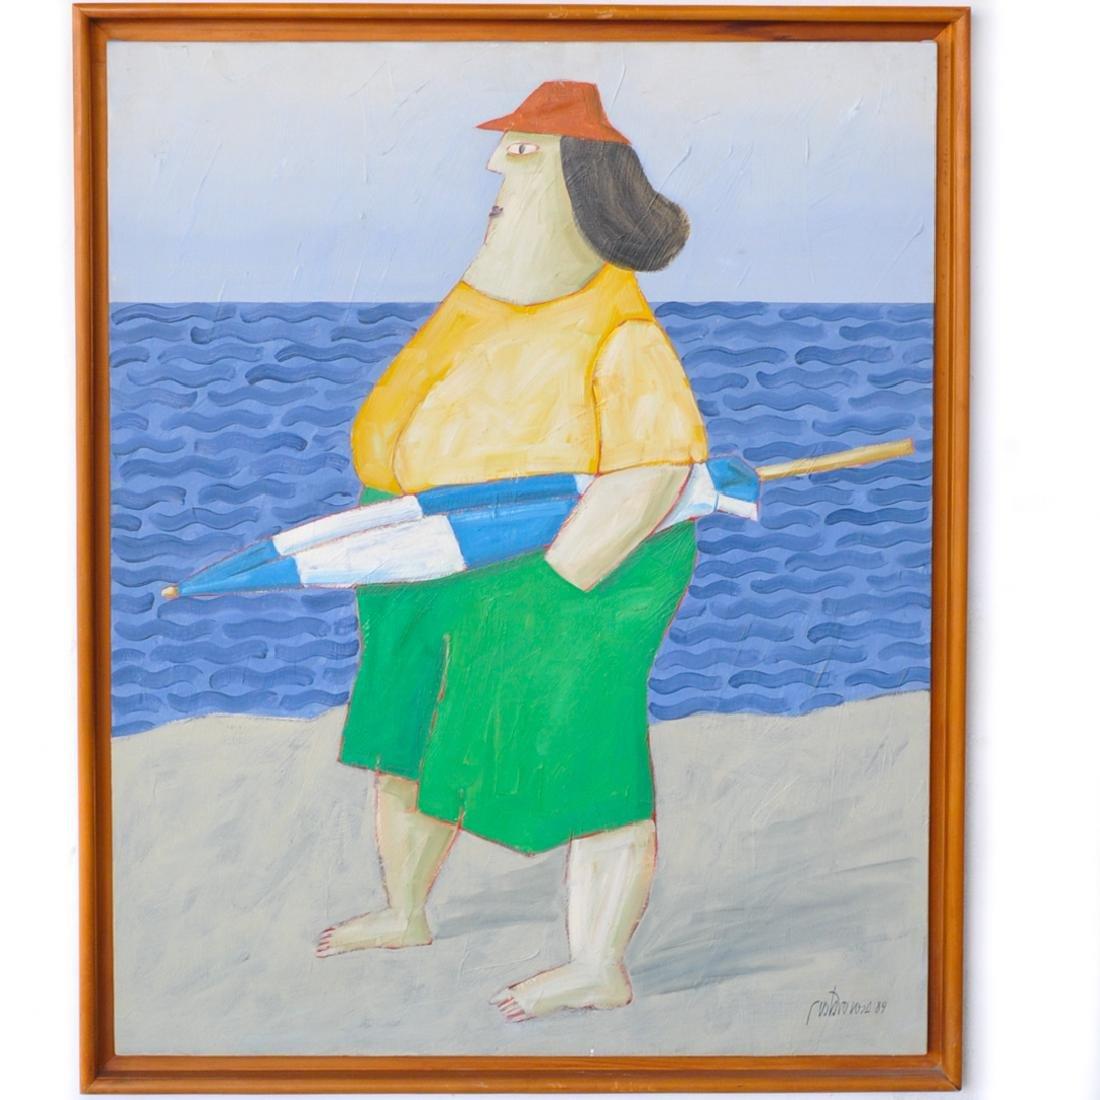 Gustavo Rosa (Brazilian, 1946-2013) Oil Painting